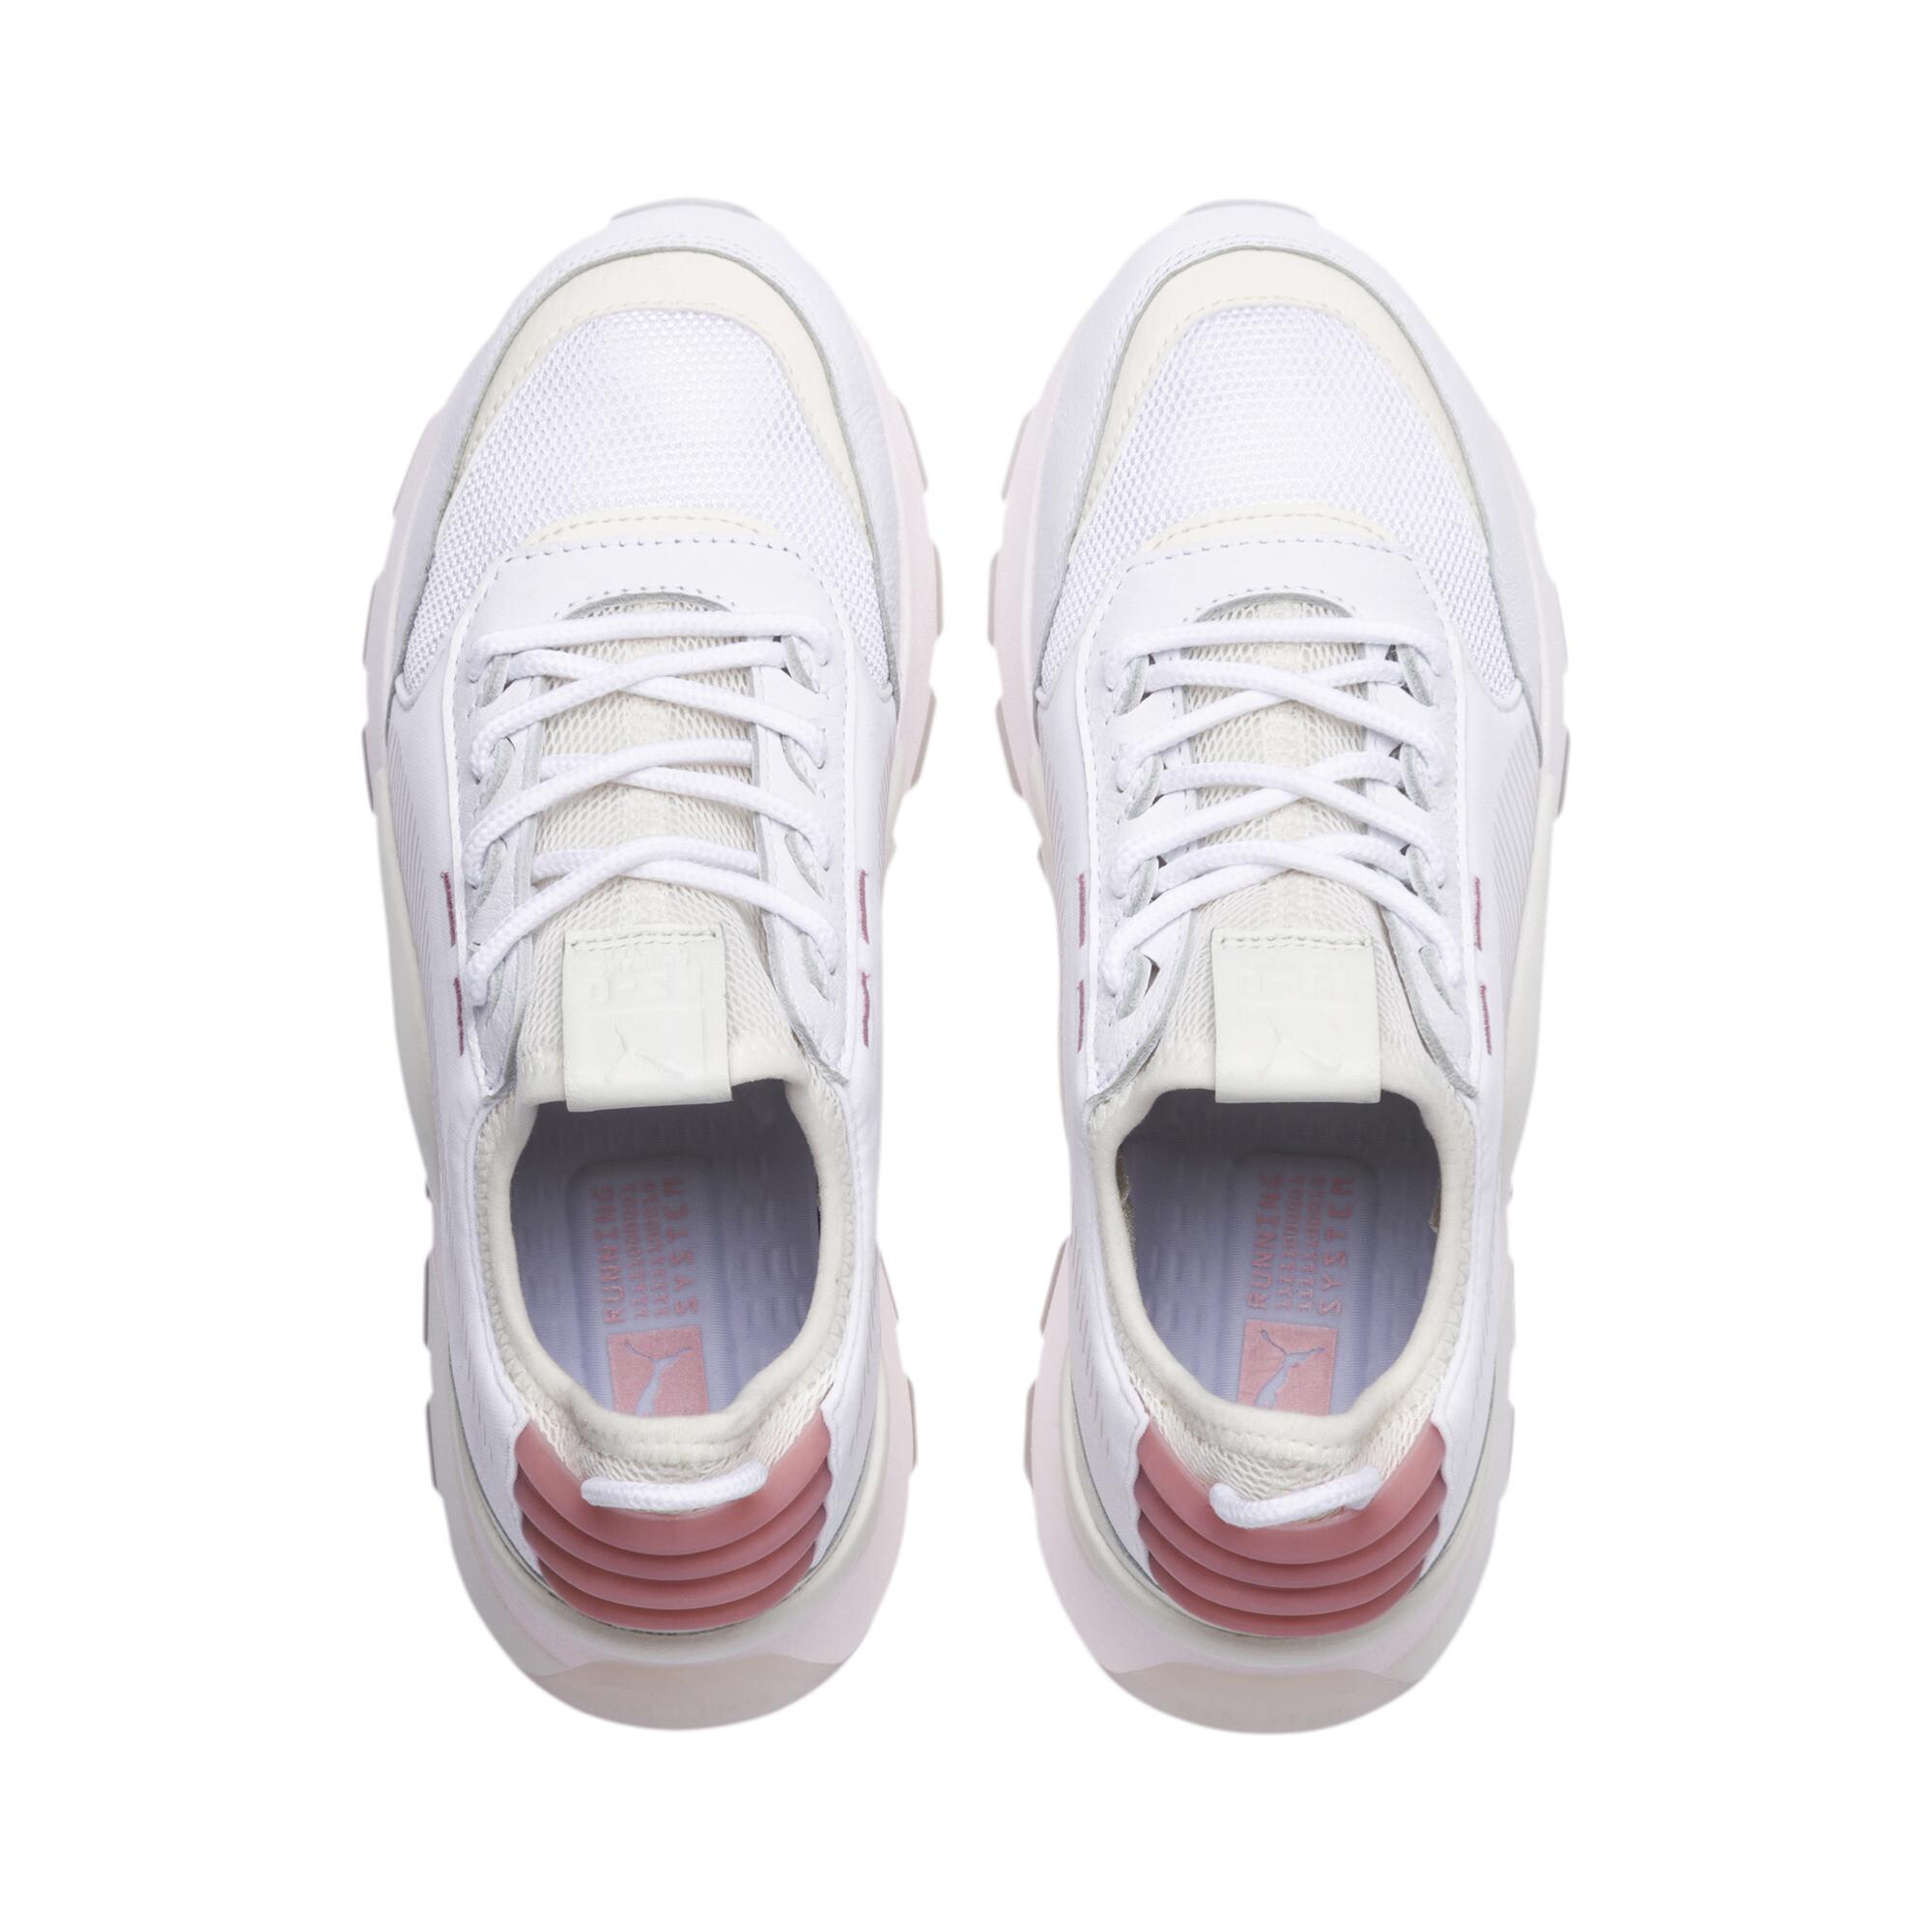 PUMA-RS-0-Tracks-Unisex-Shoe-Evolution thumbnail 14